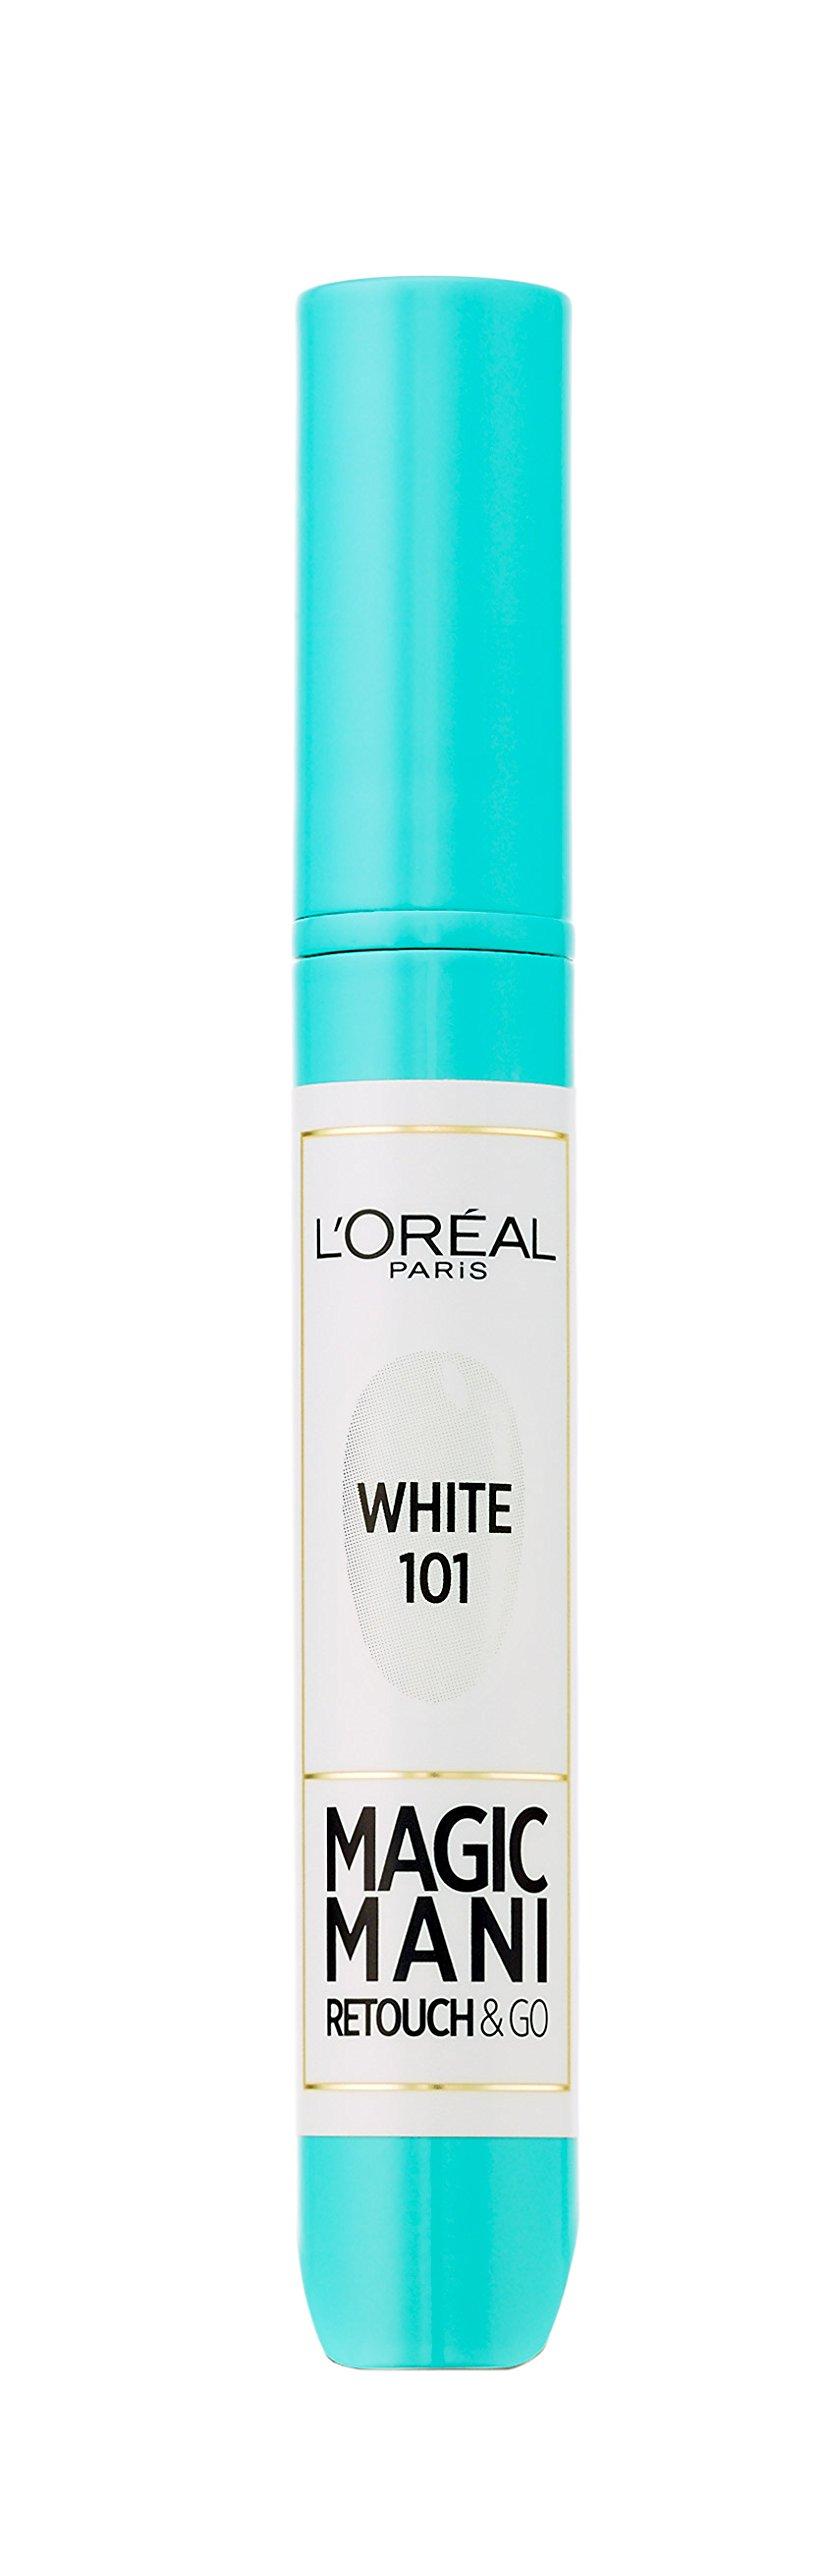 L'Oréal Paris Make-up designer Retocador de Uñas Instantáneo Magic Mani Blanco 101-1 Retocador de Uñas